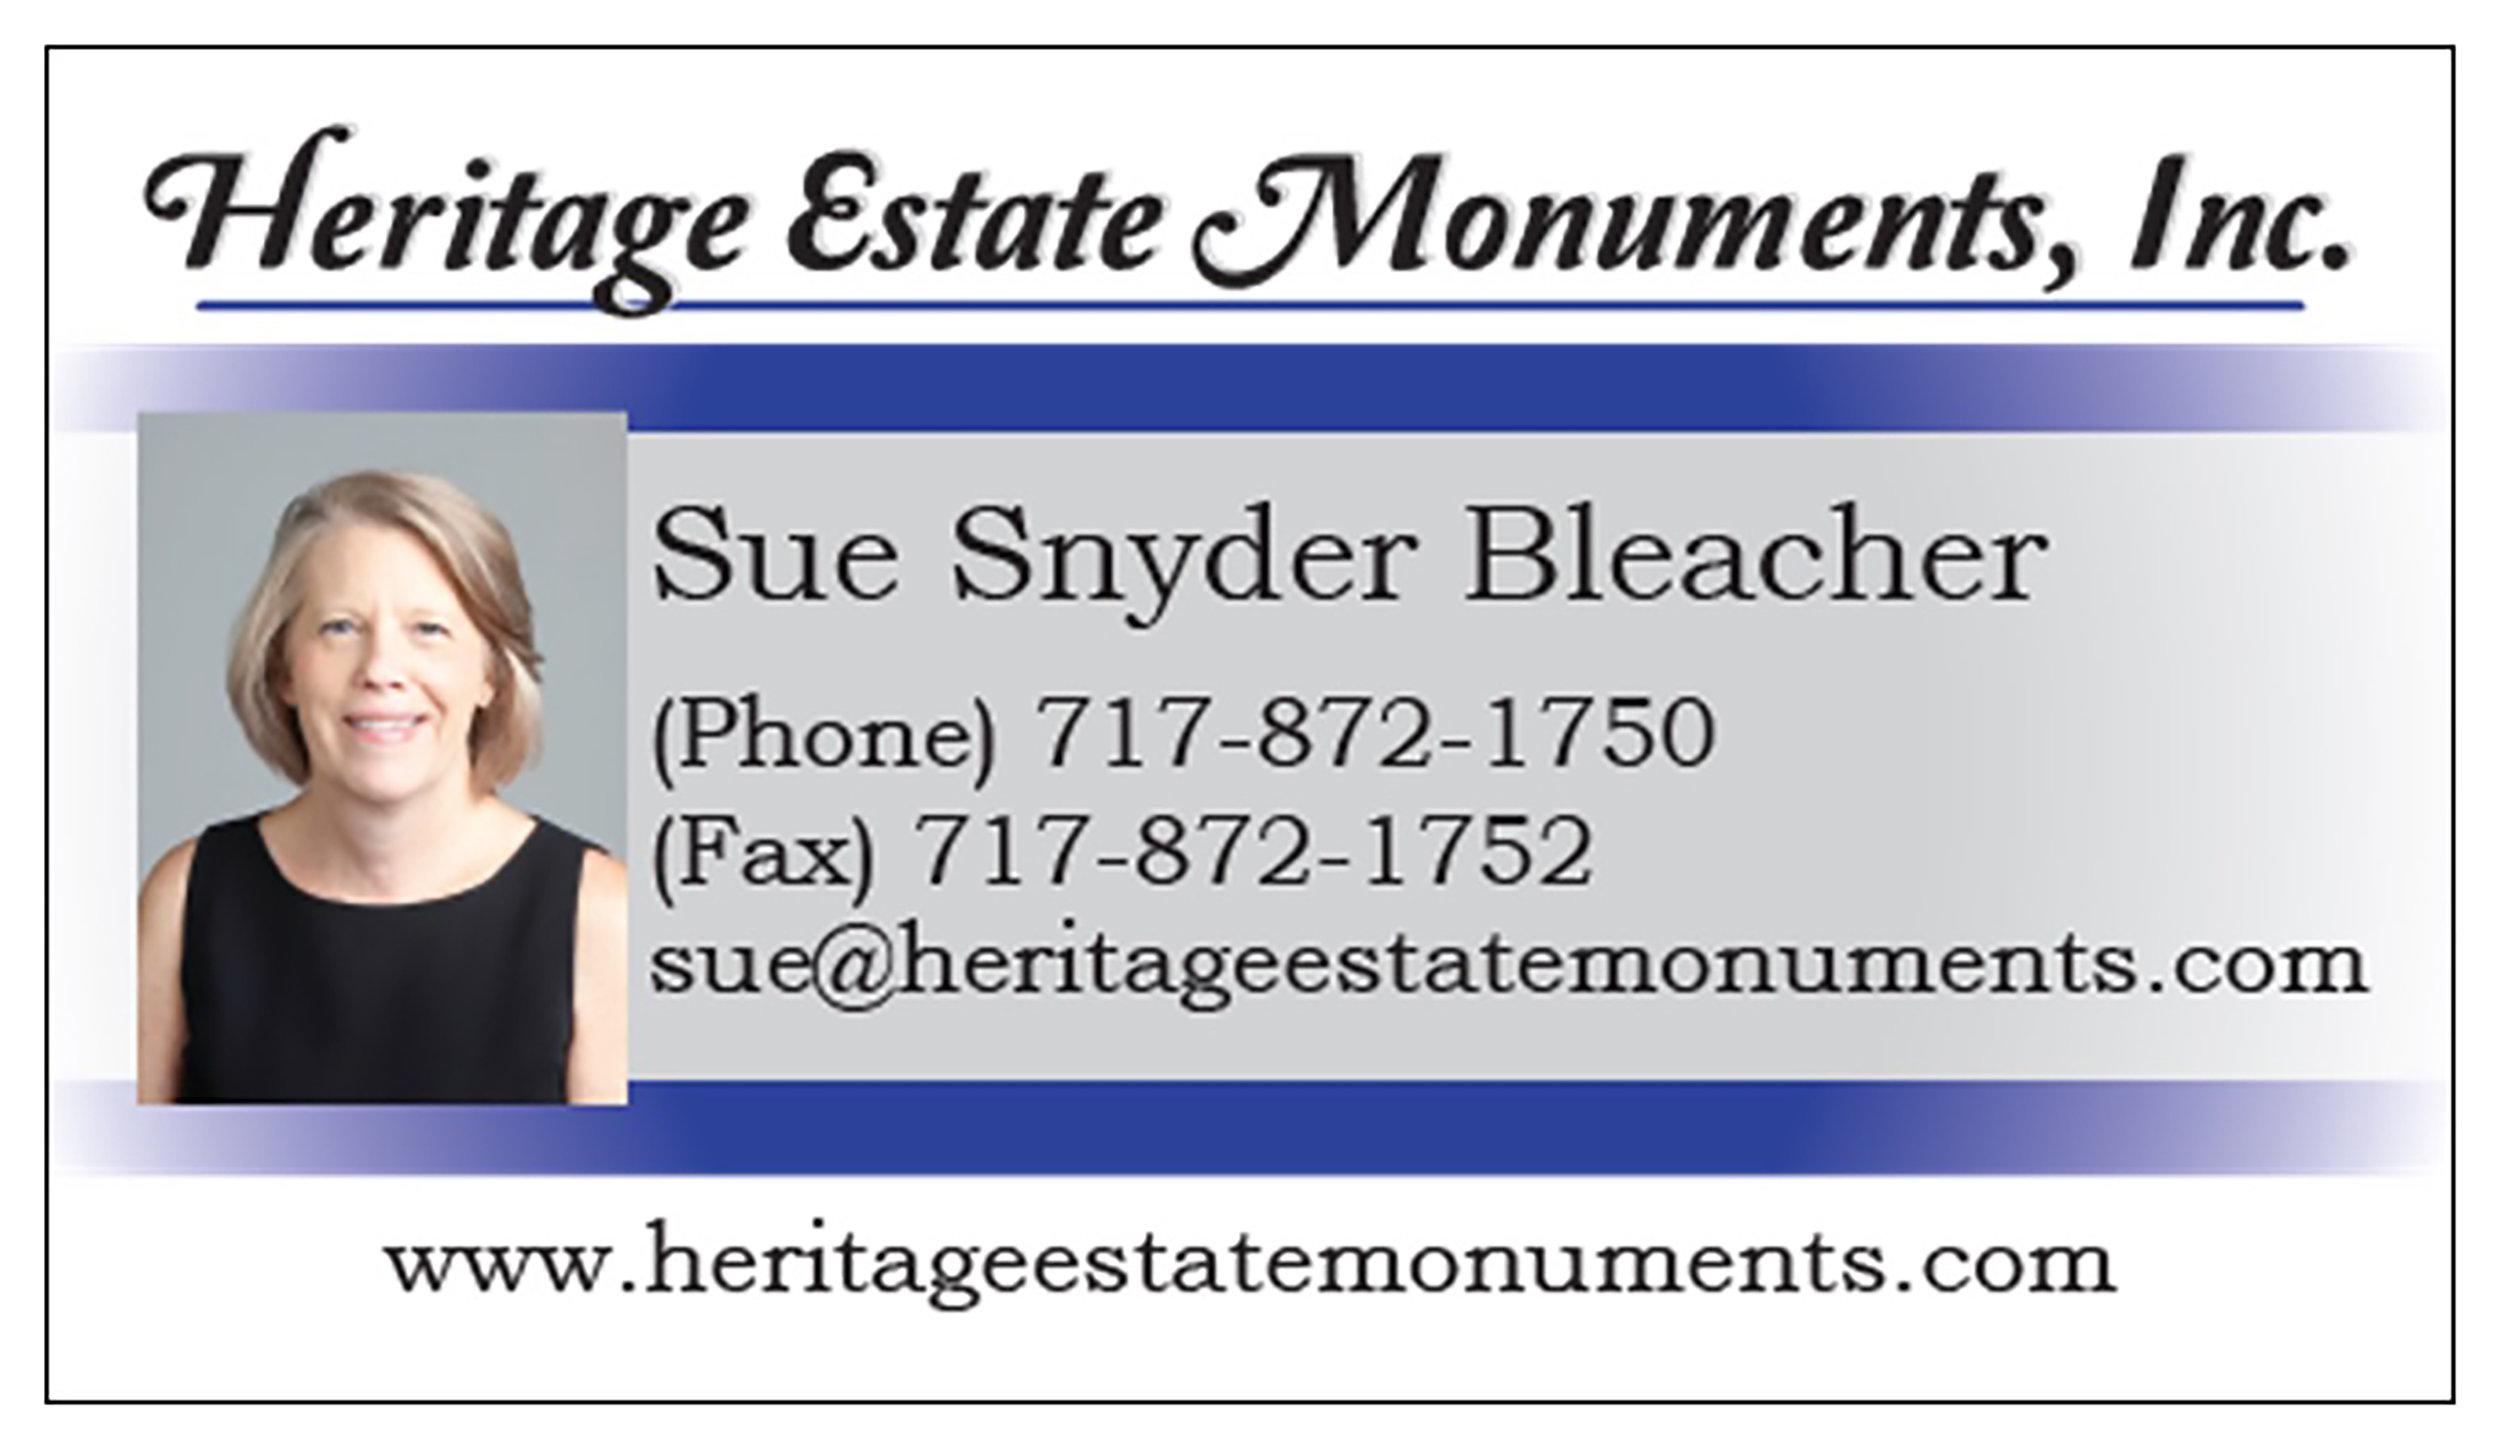 Heritage Estate Mon 300 res 160508.jpg